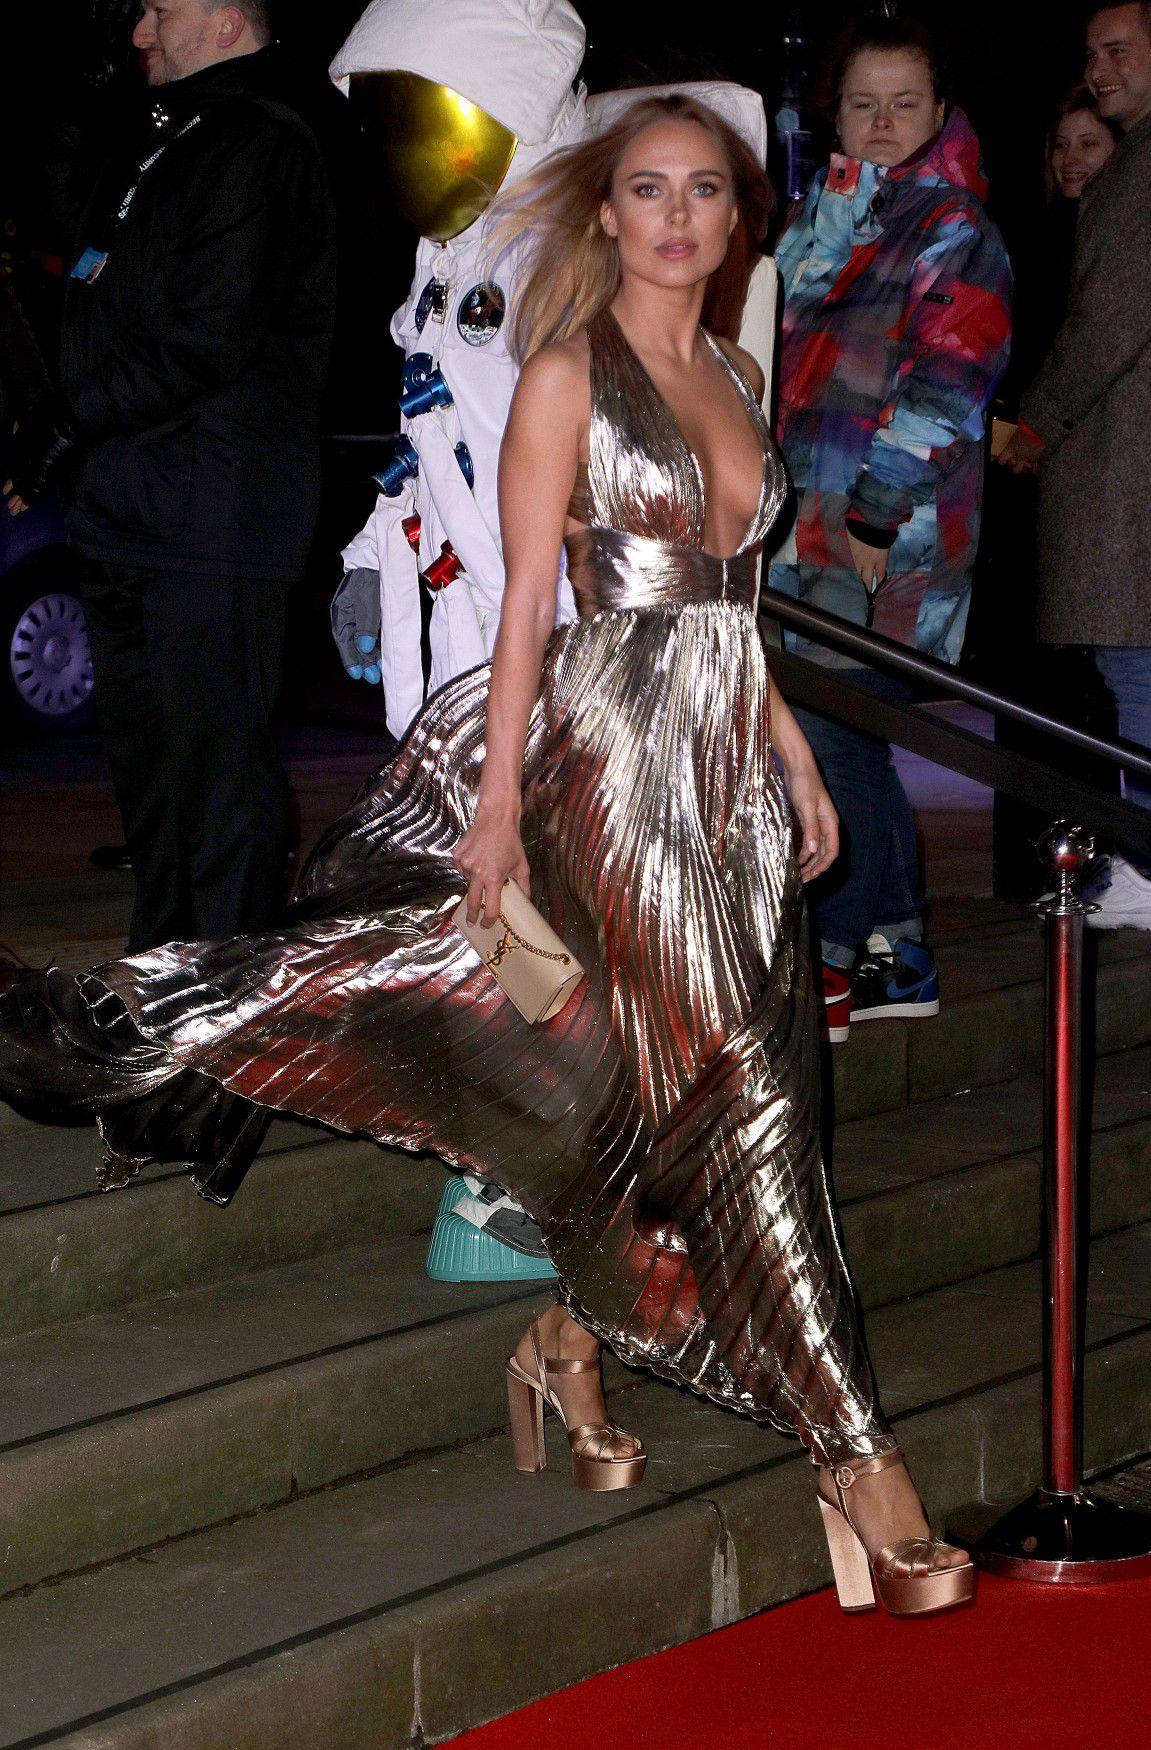 kimberley-garner-cleavage-at-fabulous-fund-fair-in-london-2235